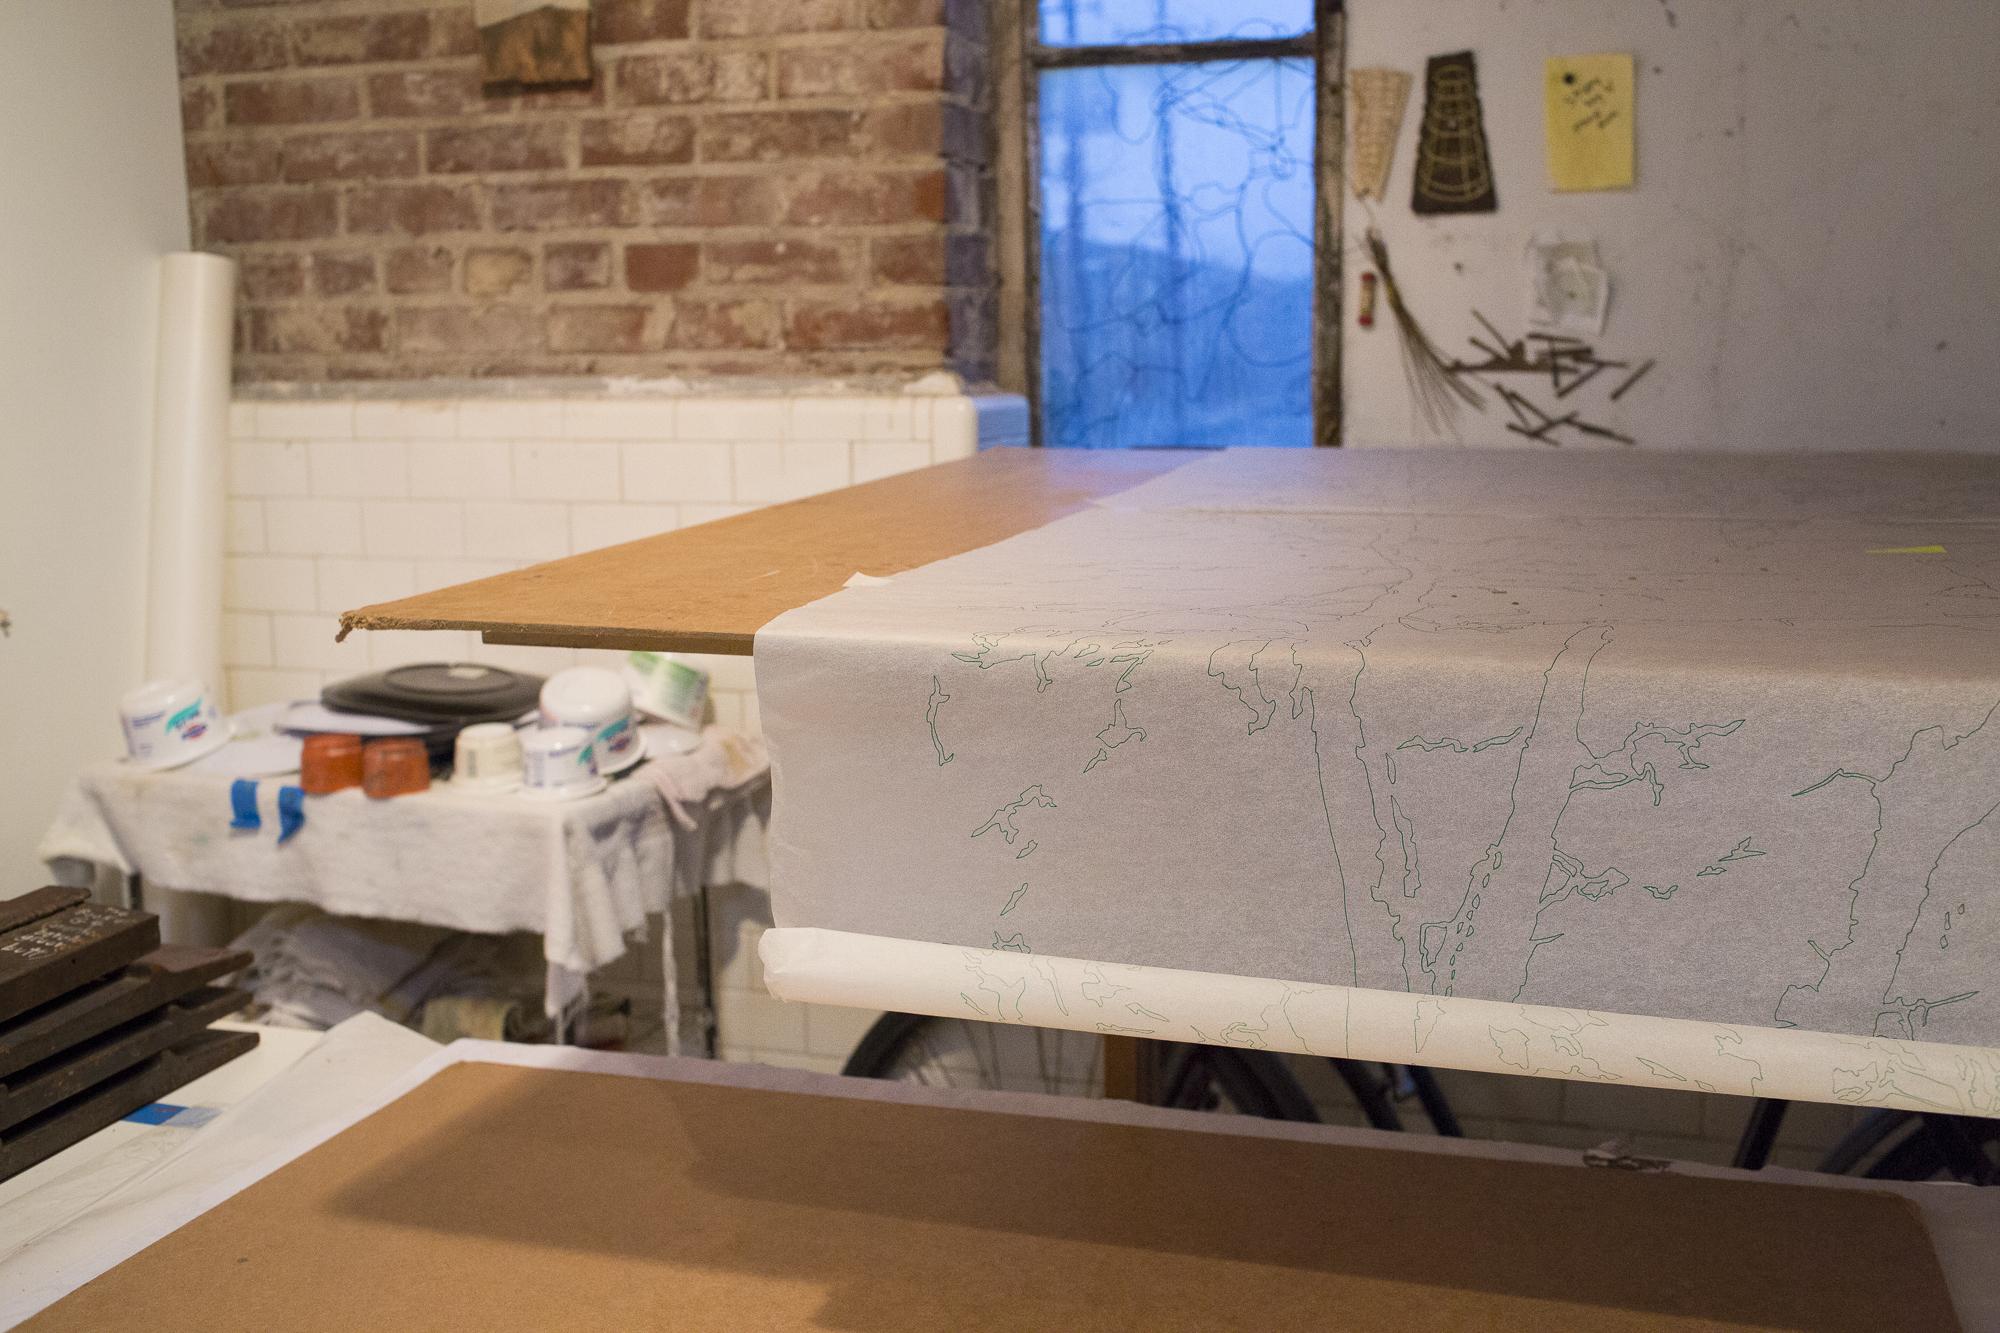 Maysey Craddock, Studio Visit, 2019 (photo: Tracy Treadwell)